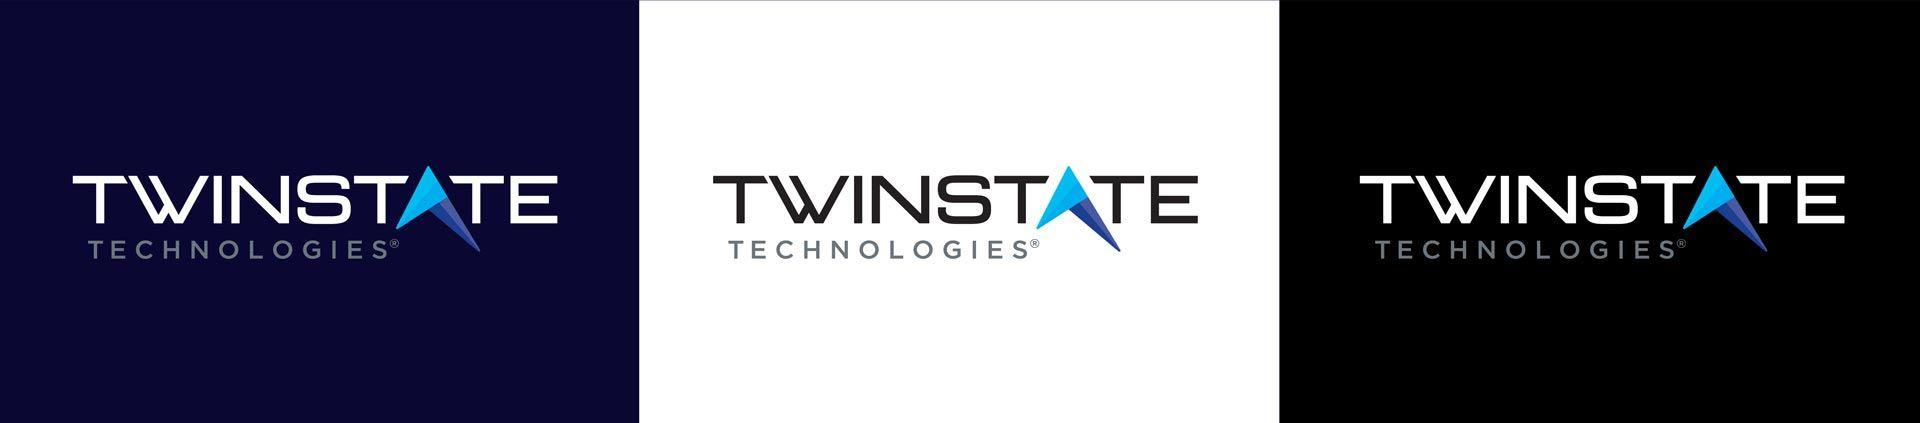 twinstate technologies logo